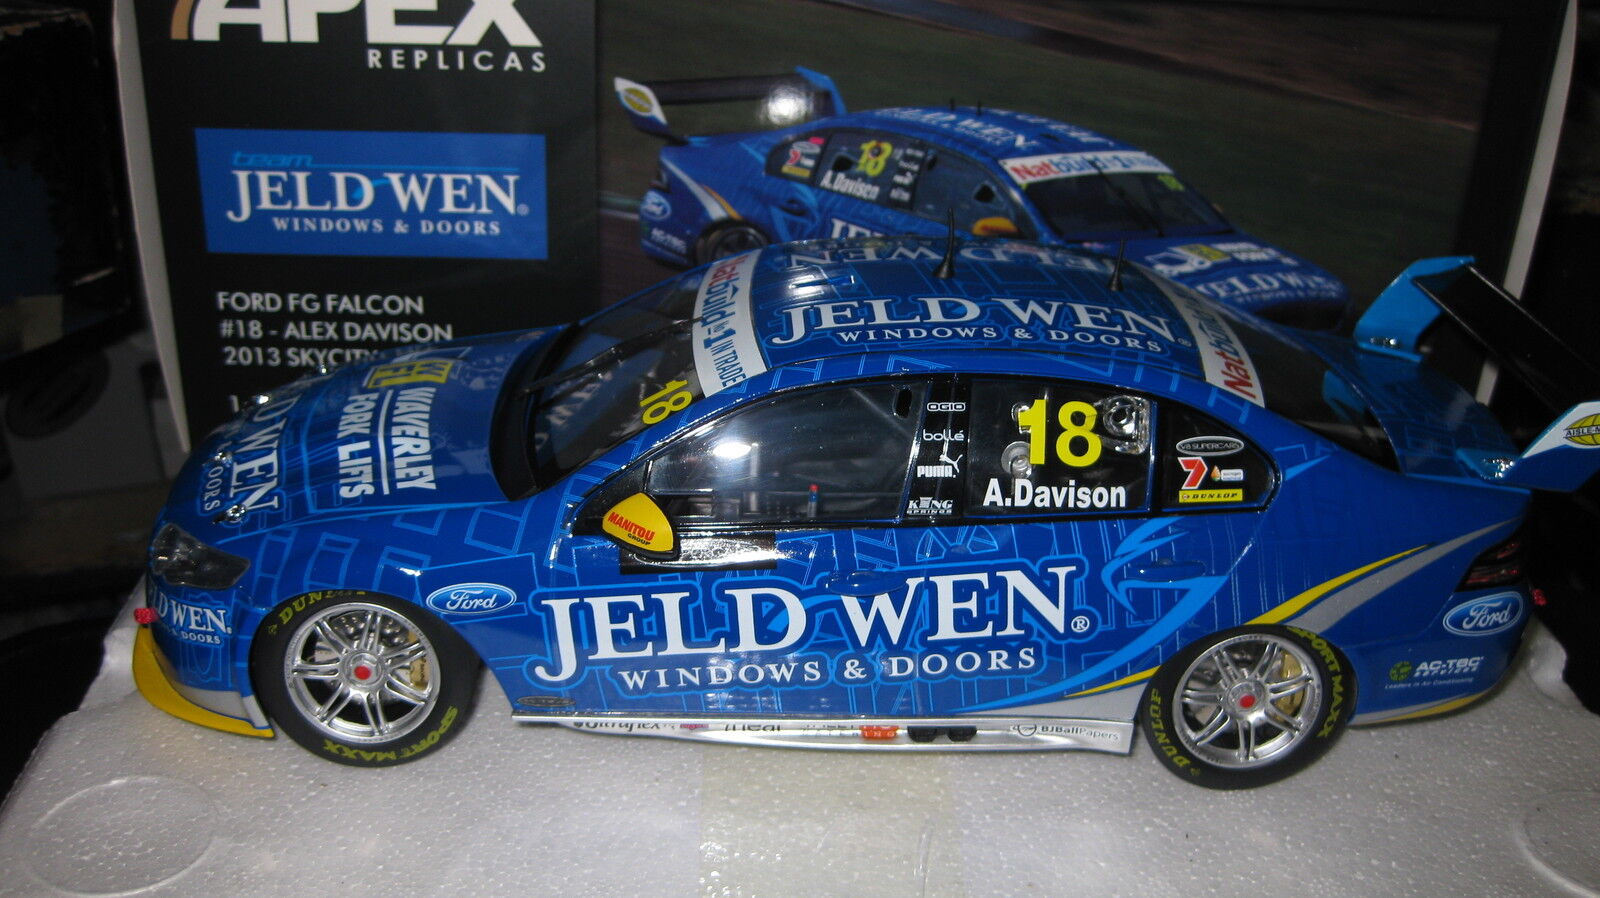 1 18 APEX FORD FG FALCON  18 ALEX DAVISON 2013 V8 SUPERCAR SKY CITY LTD ED FPR